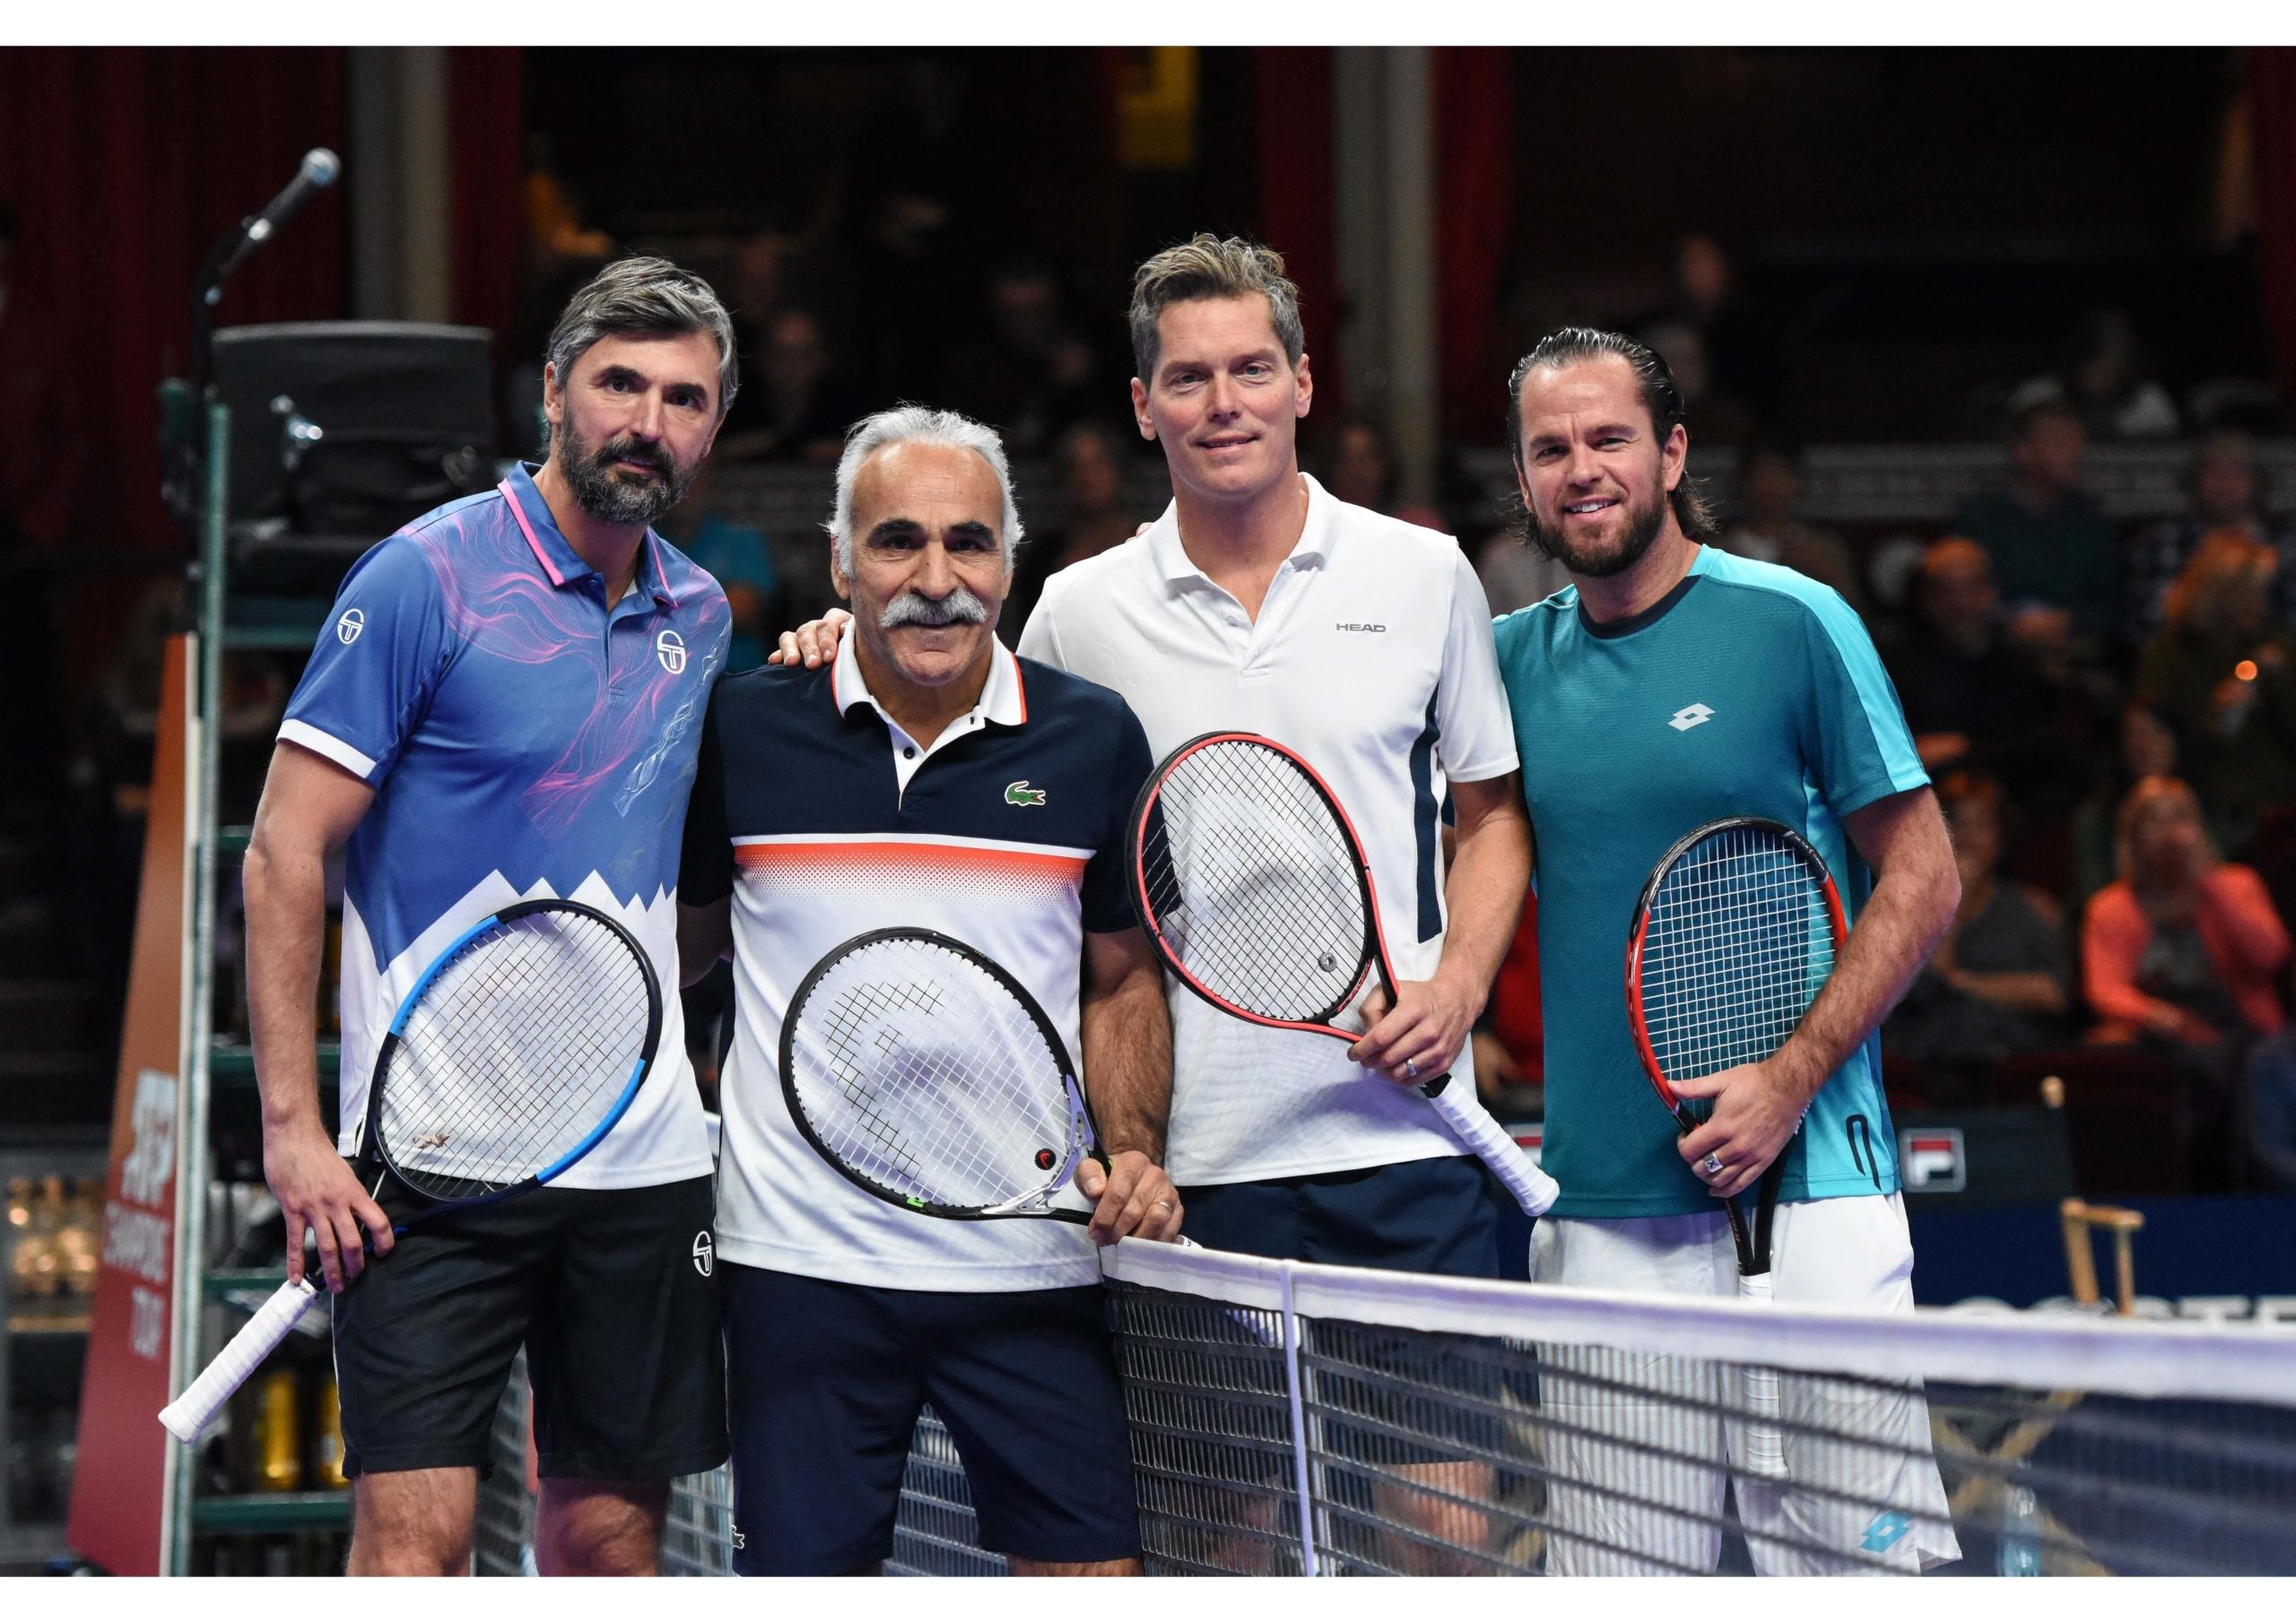 Champions Tennis Players Royal Albert Hall